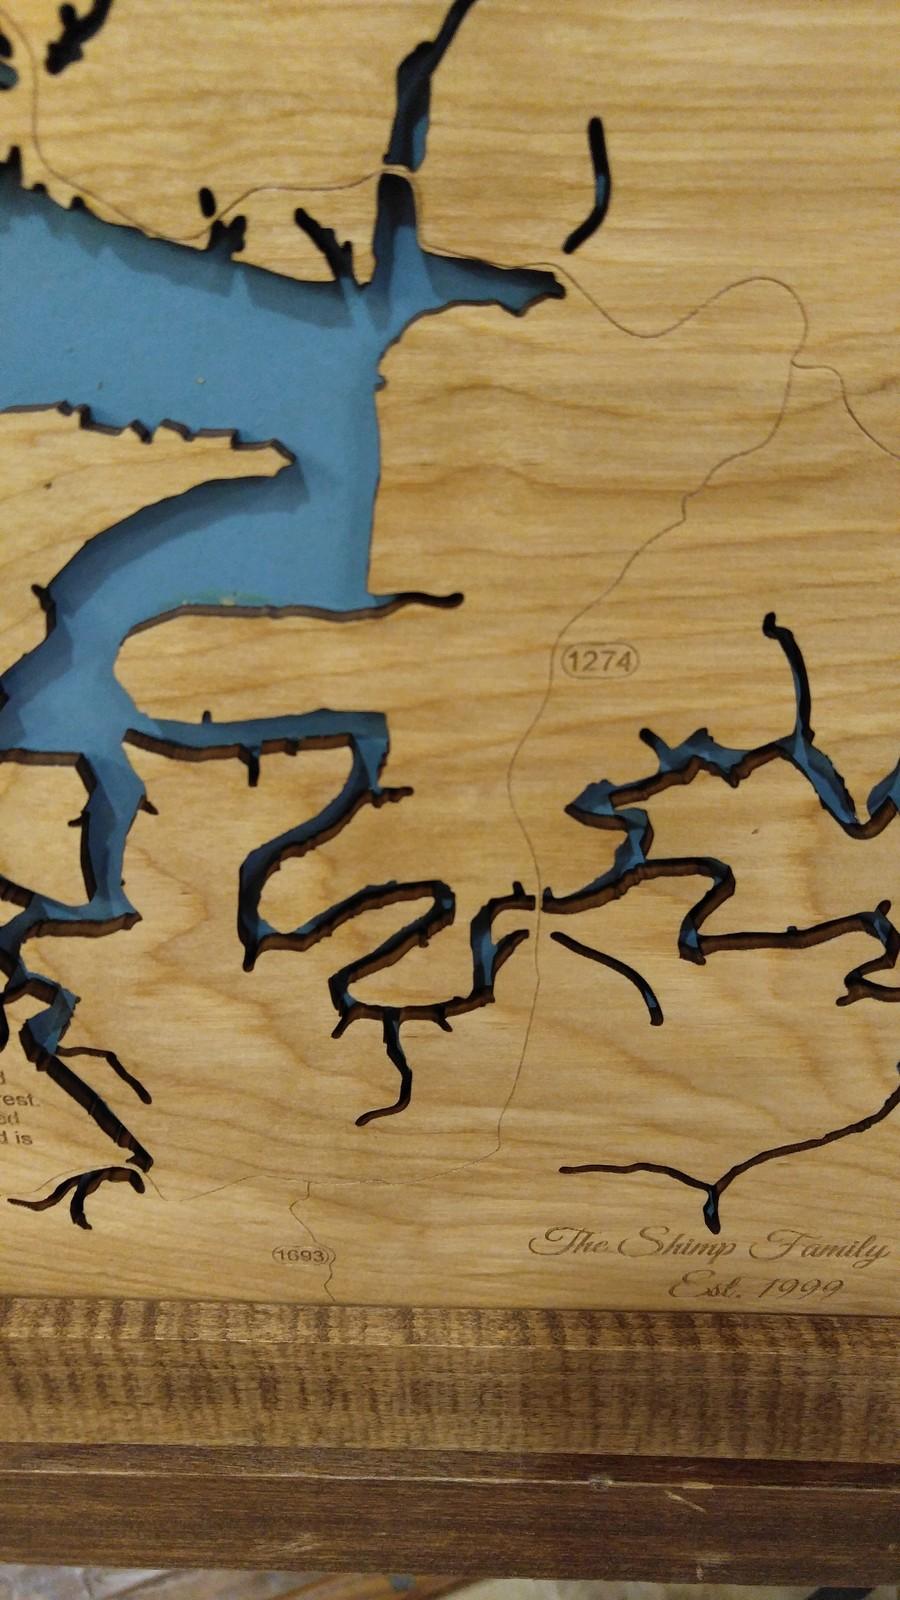 Cave Run Lake, Kentucky - Laser Cut Wood Map and 41 similar items Kentucky Road Map Laser Cutter on